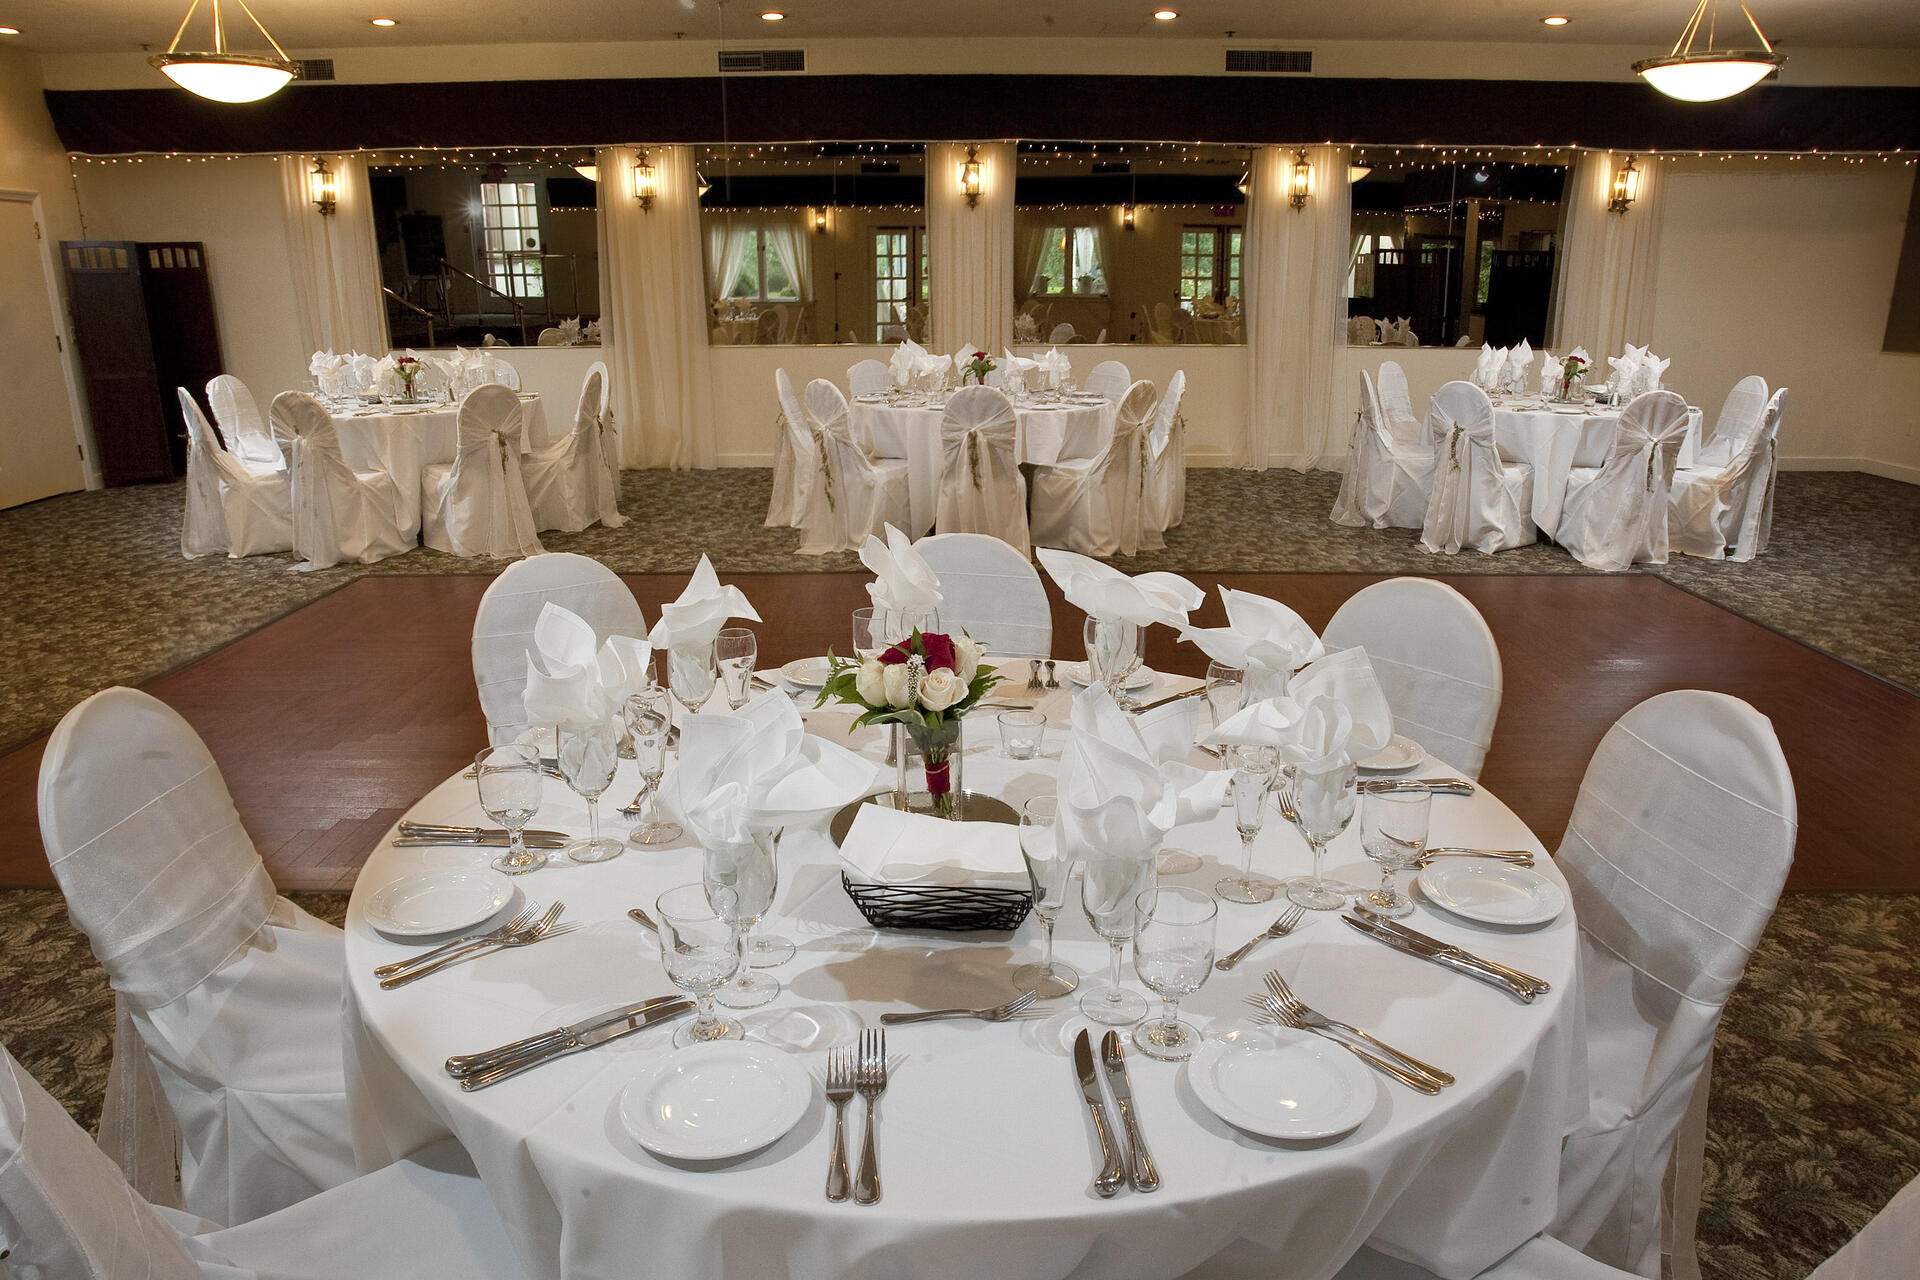 Wedding in Banquet Hall